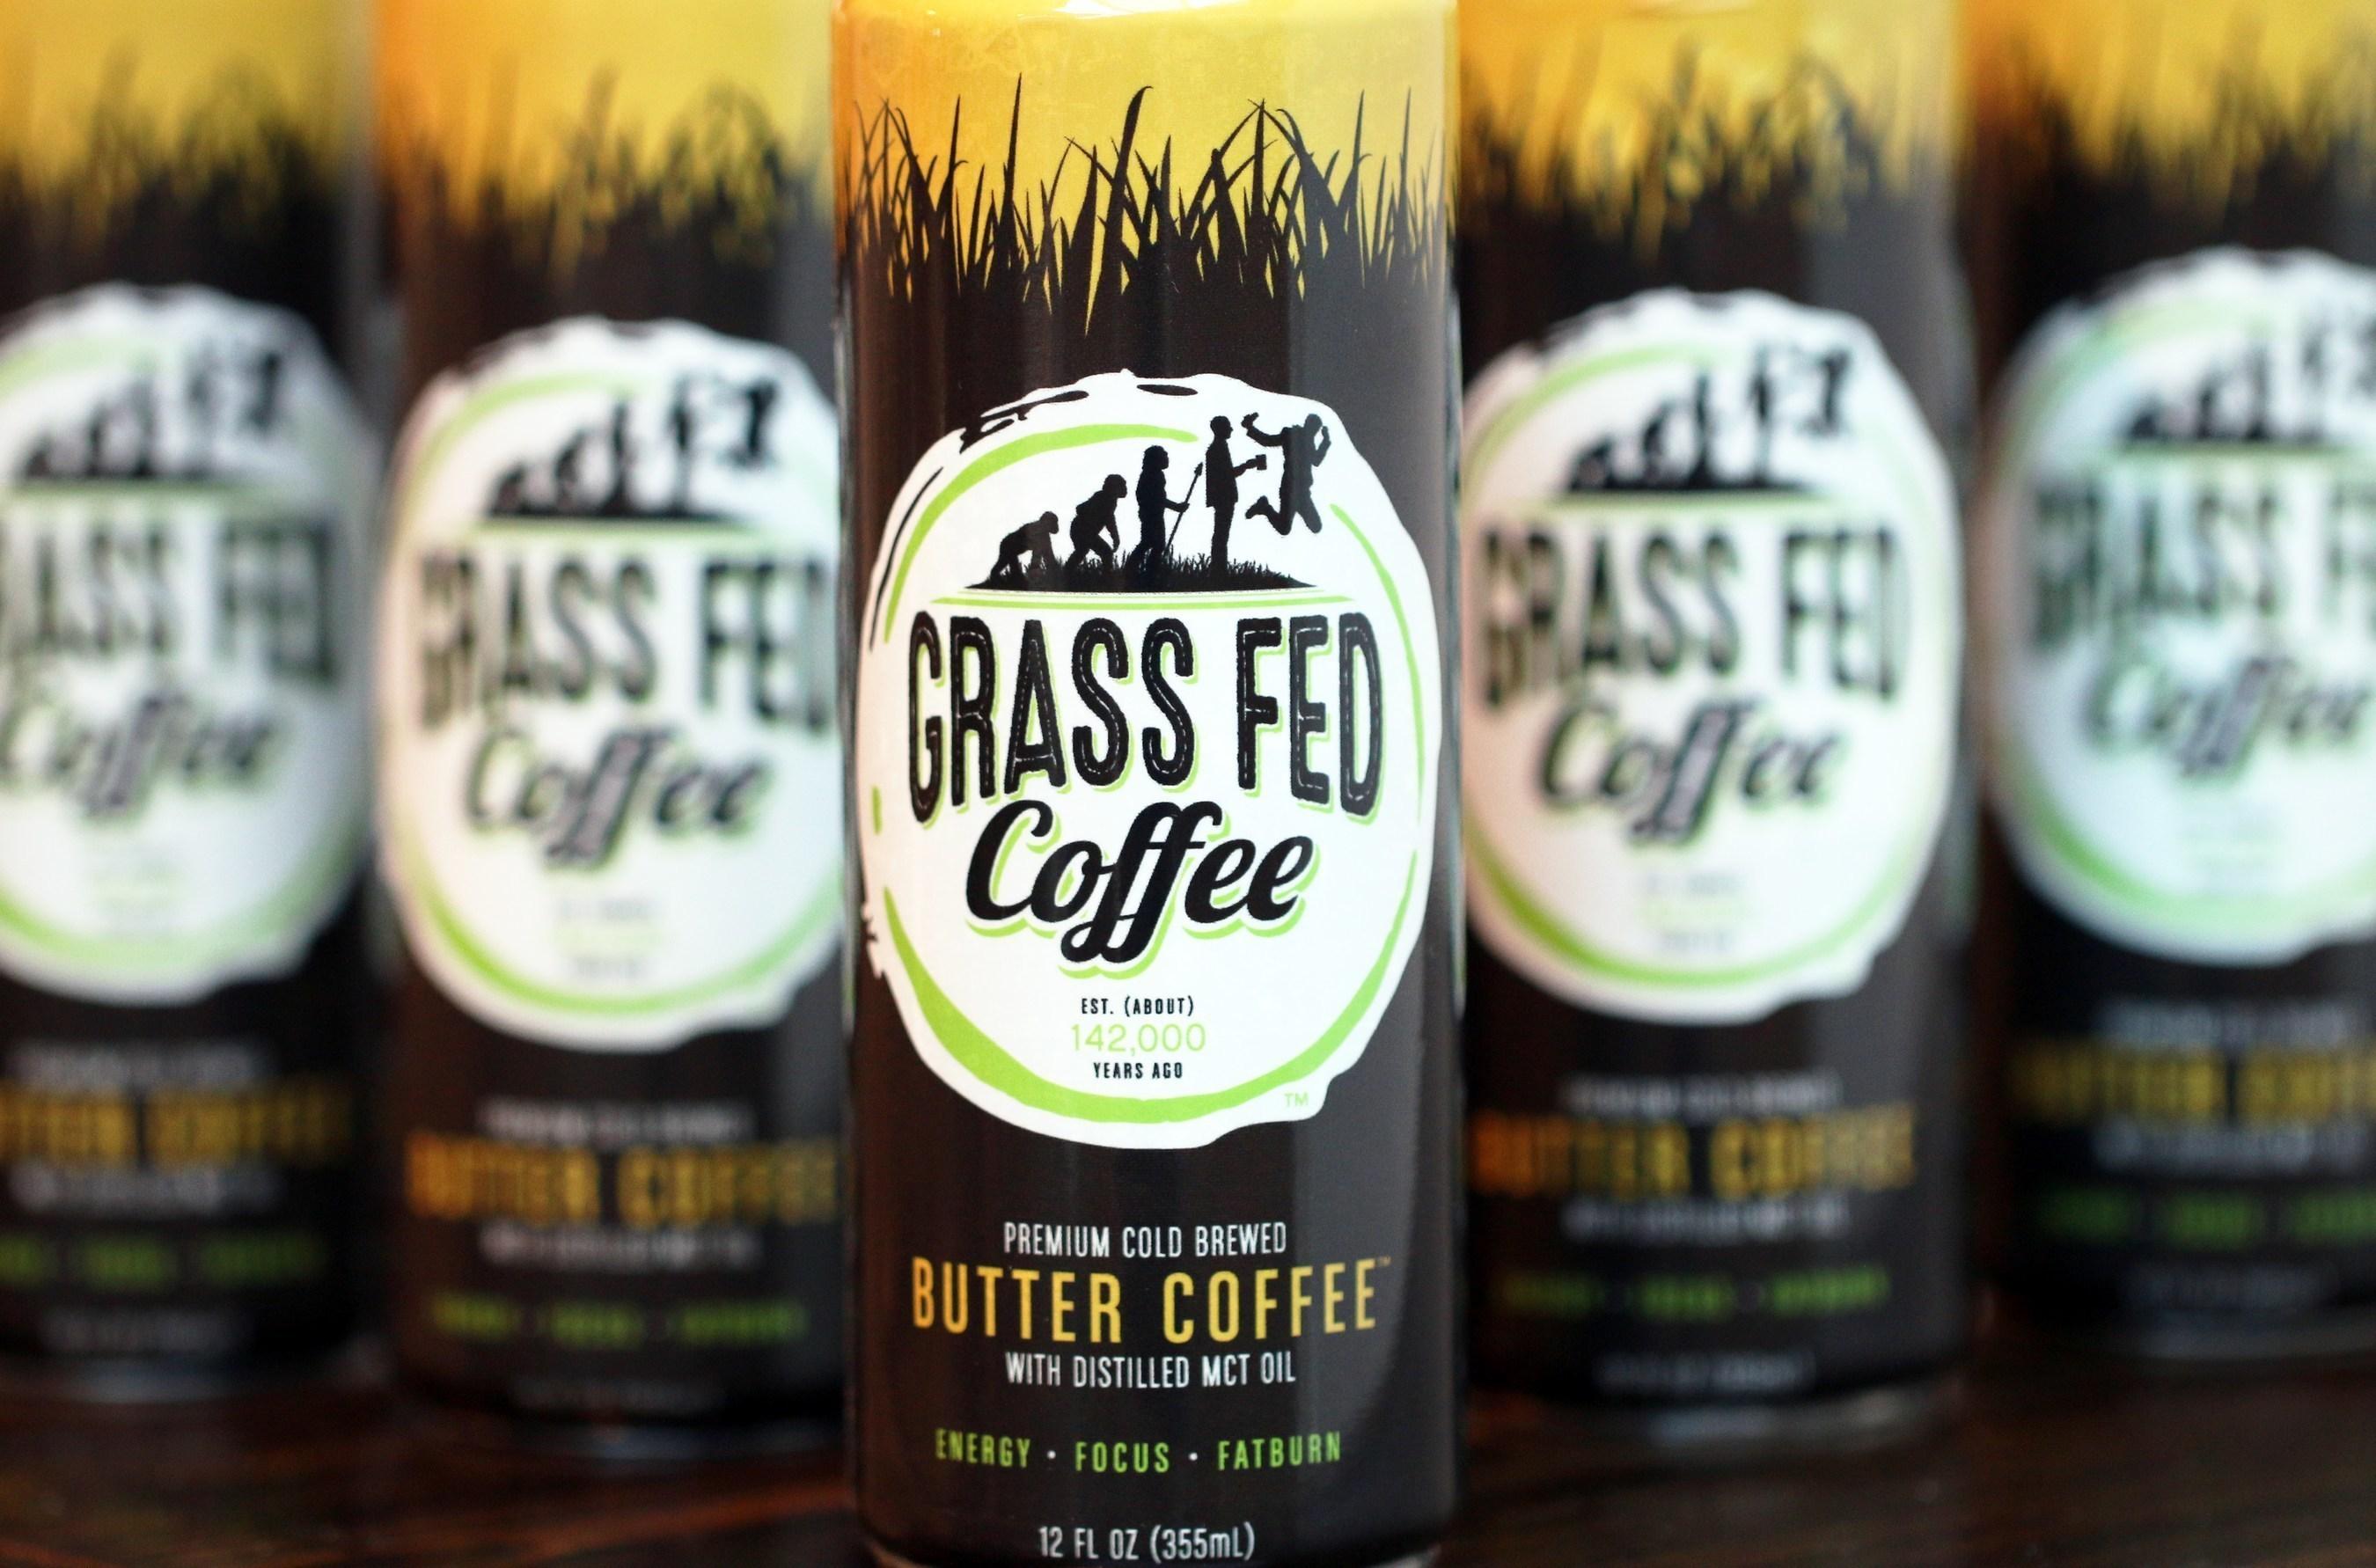 Grass Fed Coffee Kickstarter Campaign Surpasses Its Kickstarter Goal By A Staggering 500%